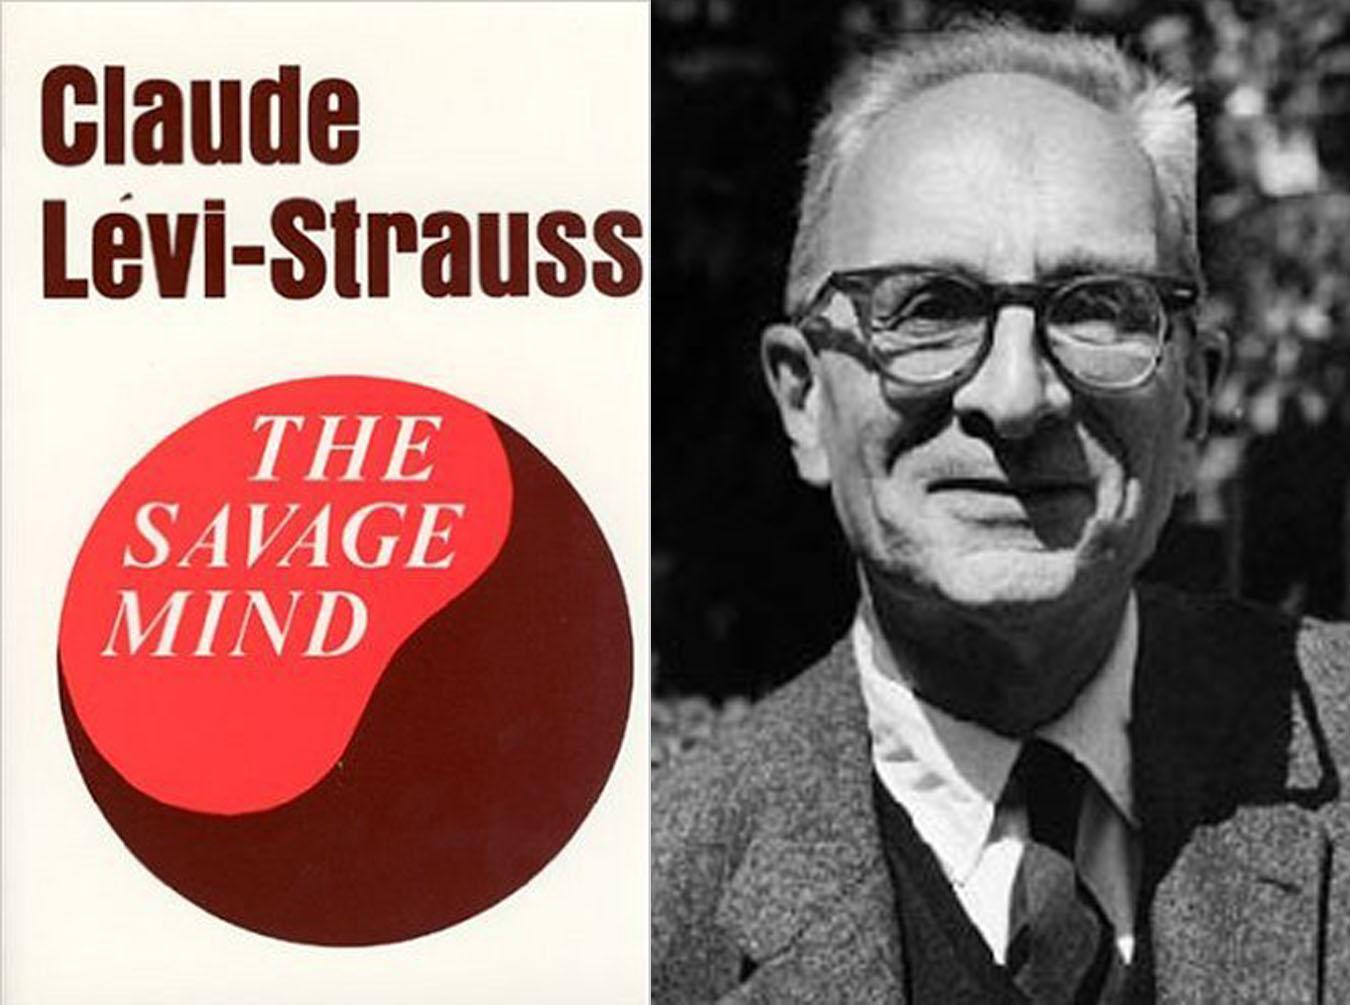 Claude Levi-Strauss (1908-2009)